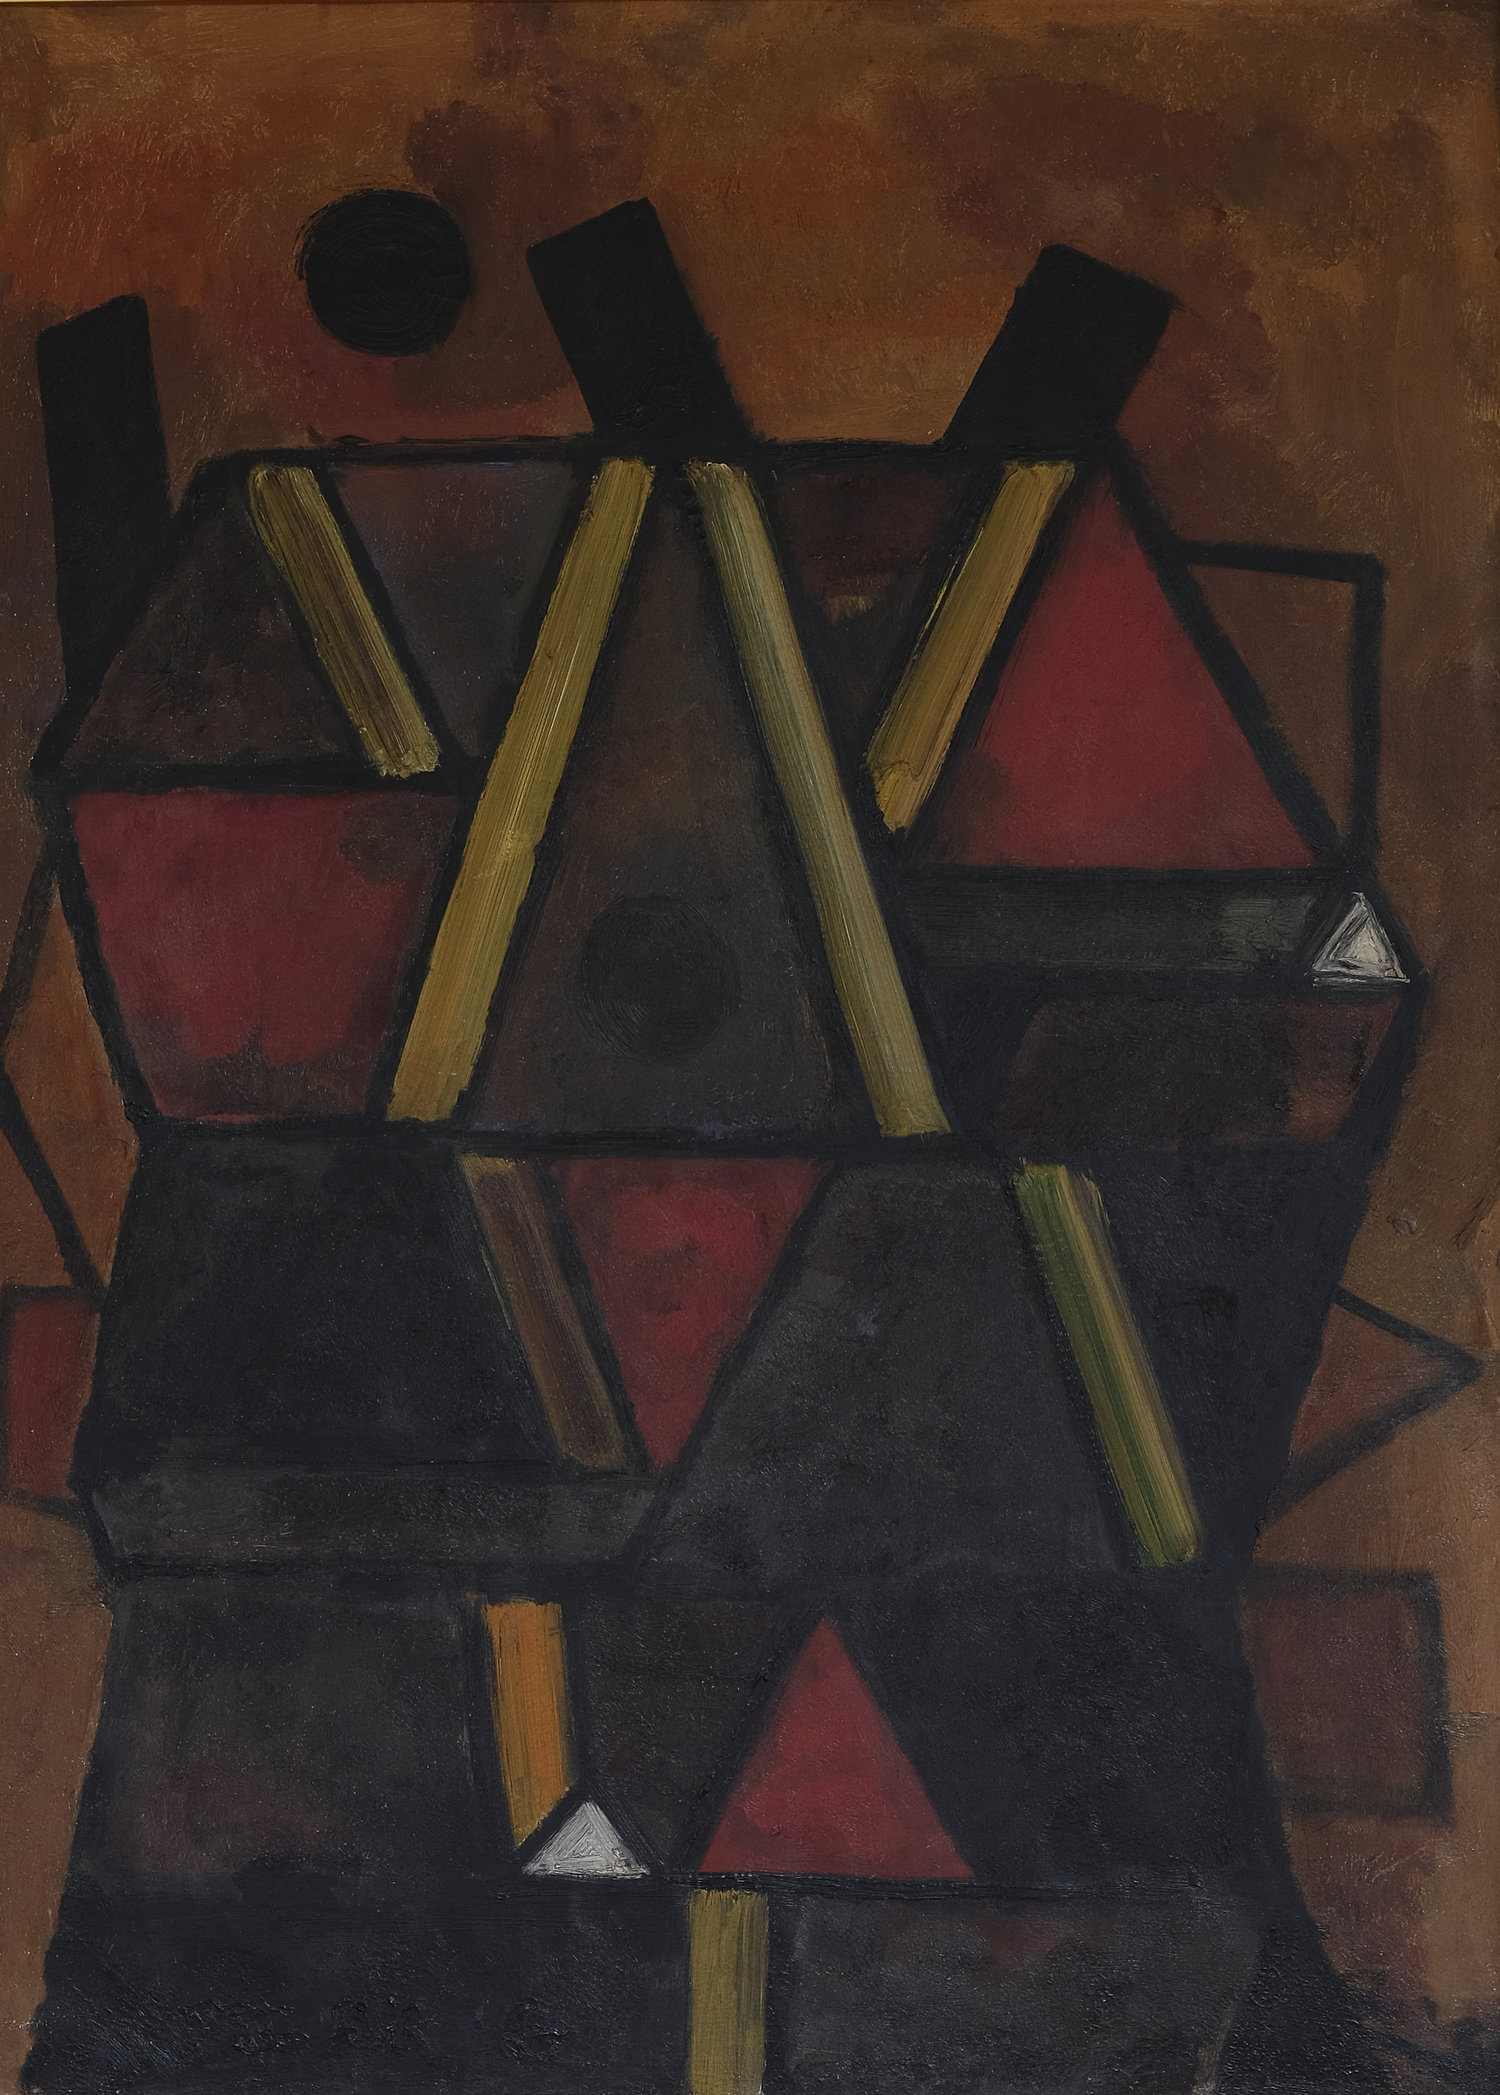 Fadjar Sidik, Abstraksi, oil on canvas, 138 x 100cm, 1967